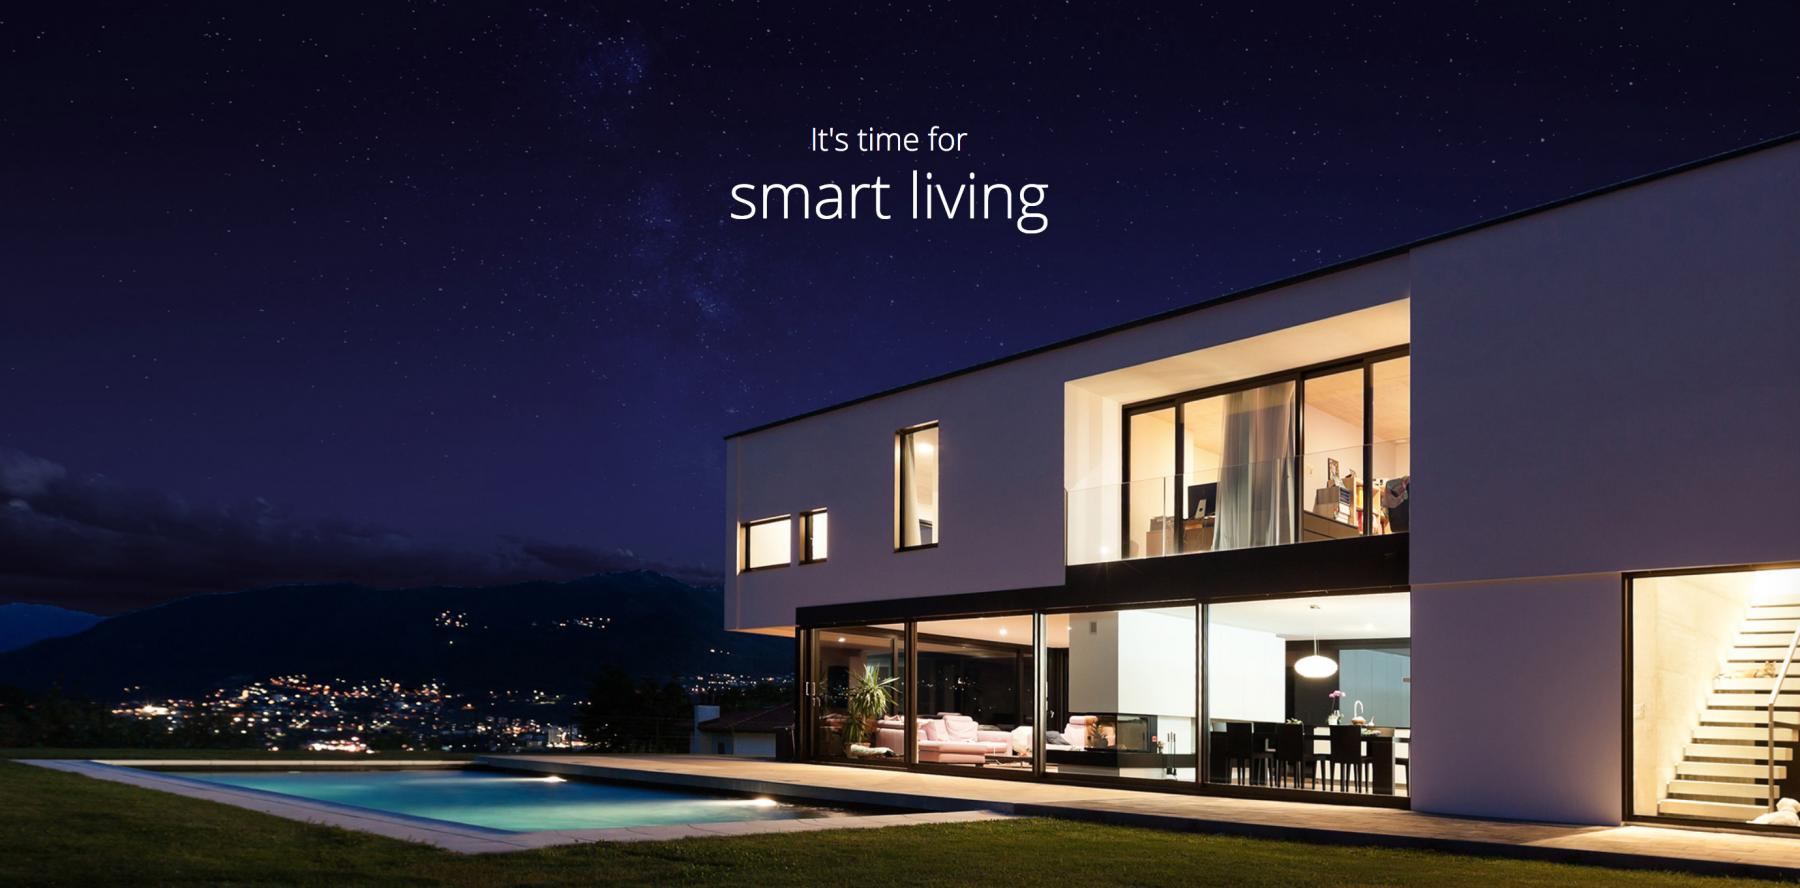 Fibaro - Smart living - Smarthomeworks